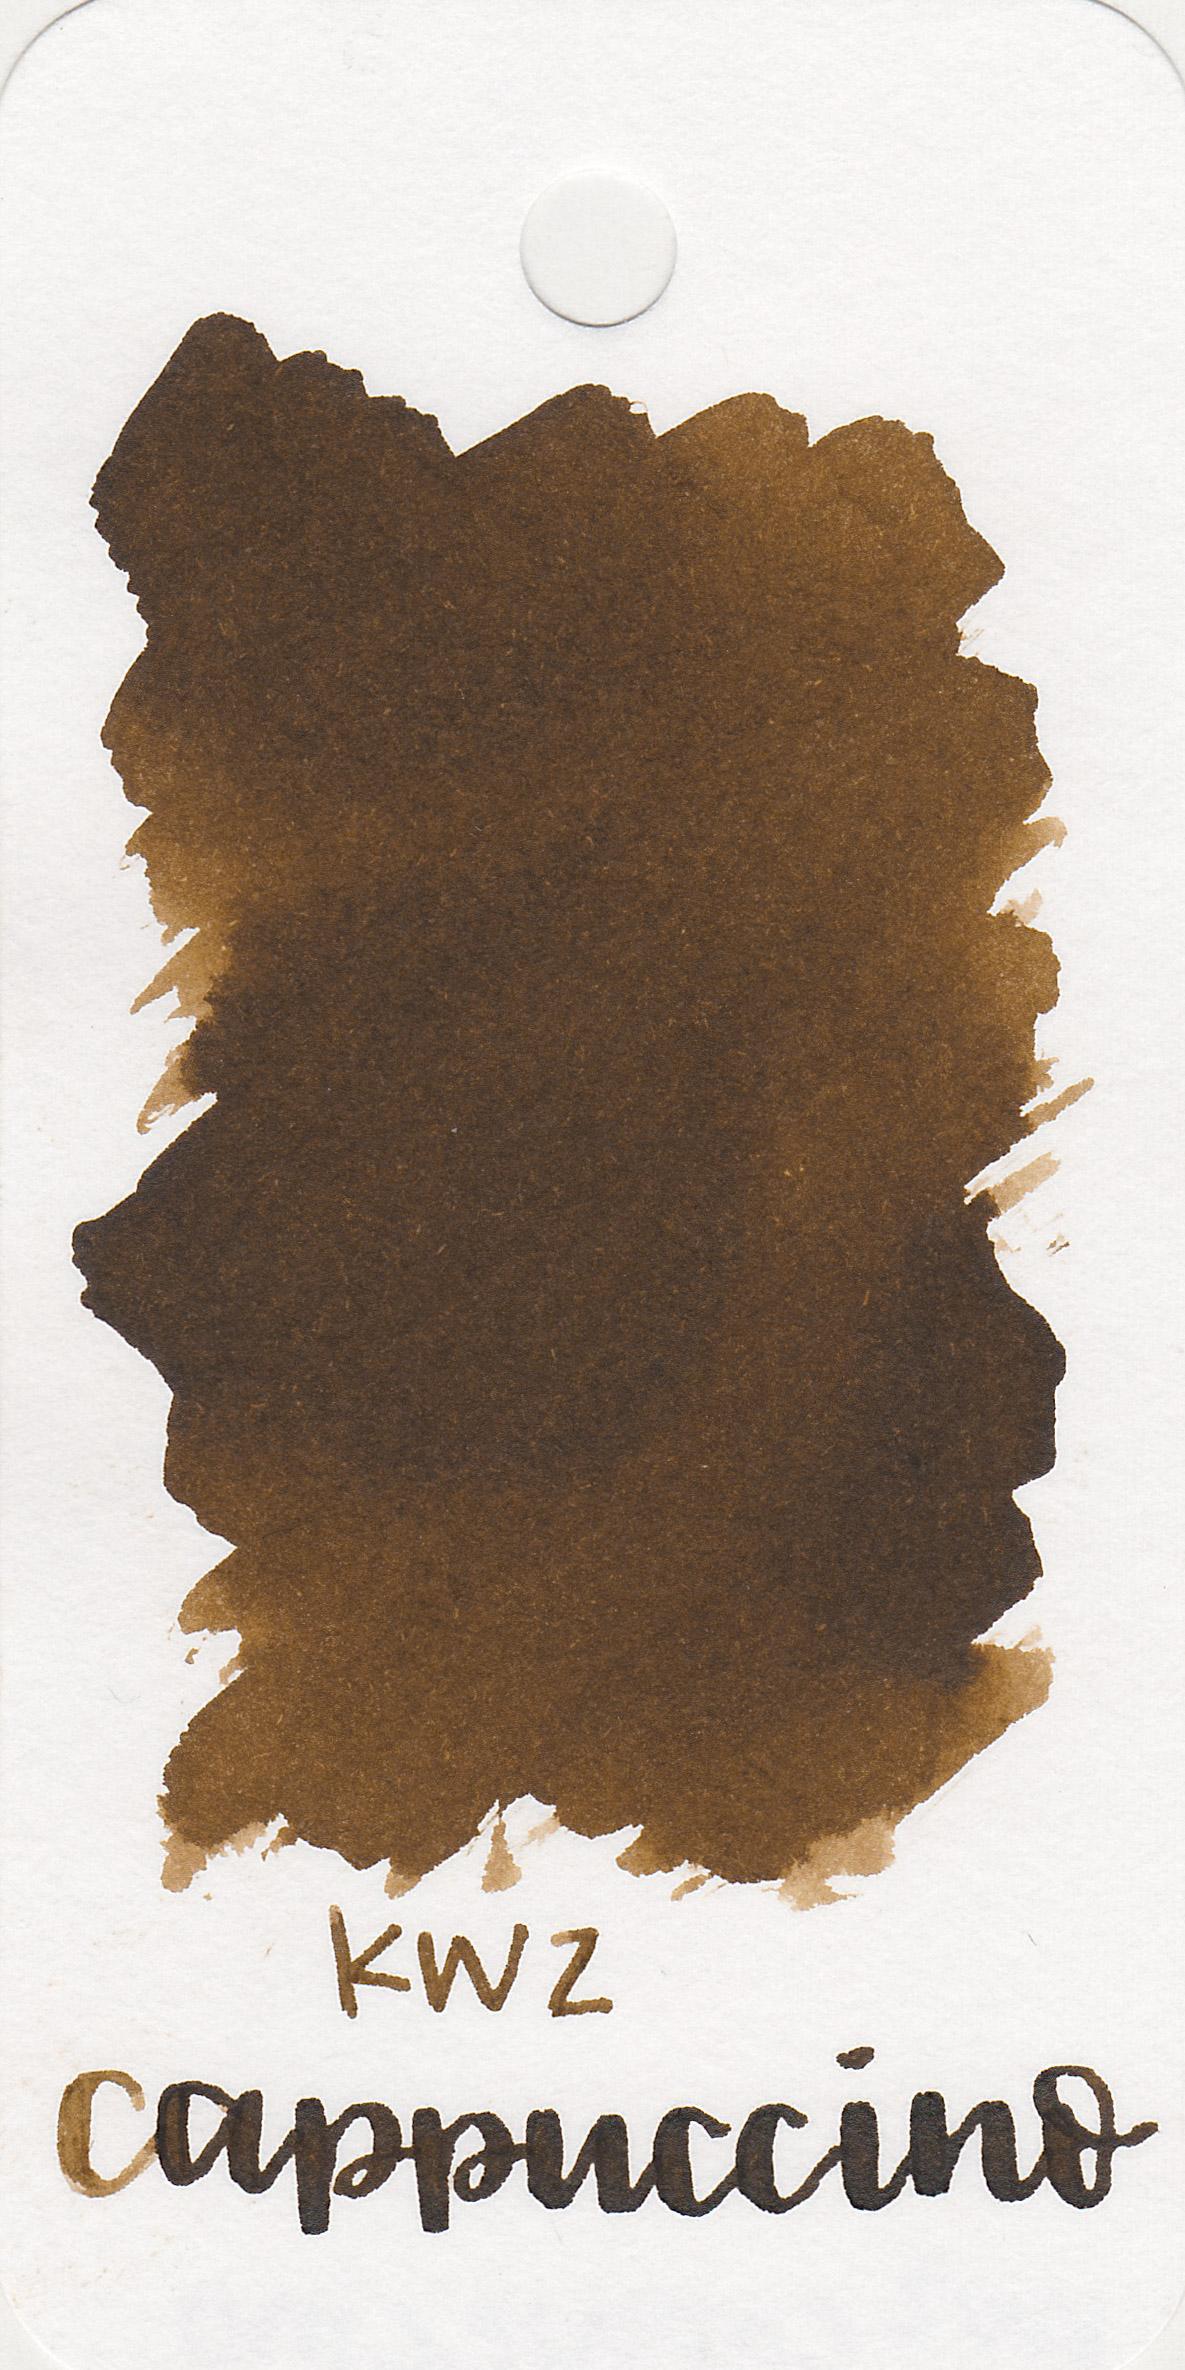 kwz-cappuccino-1.jpg